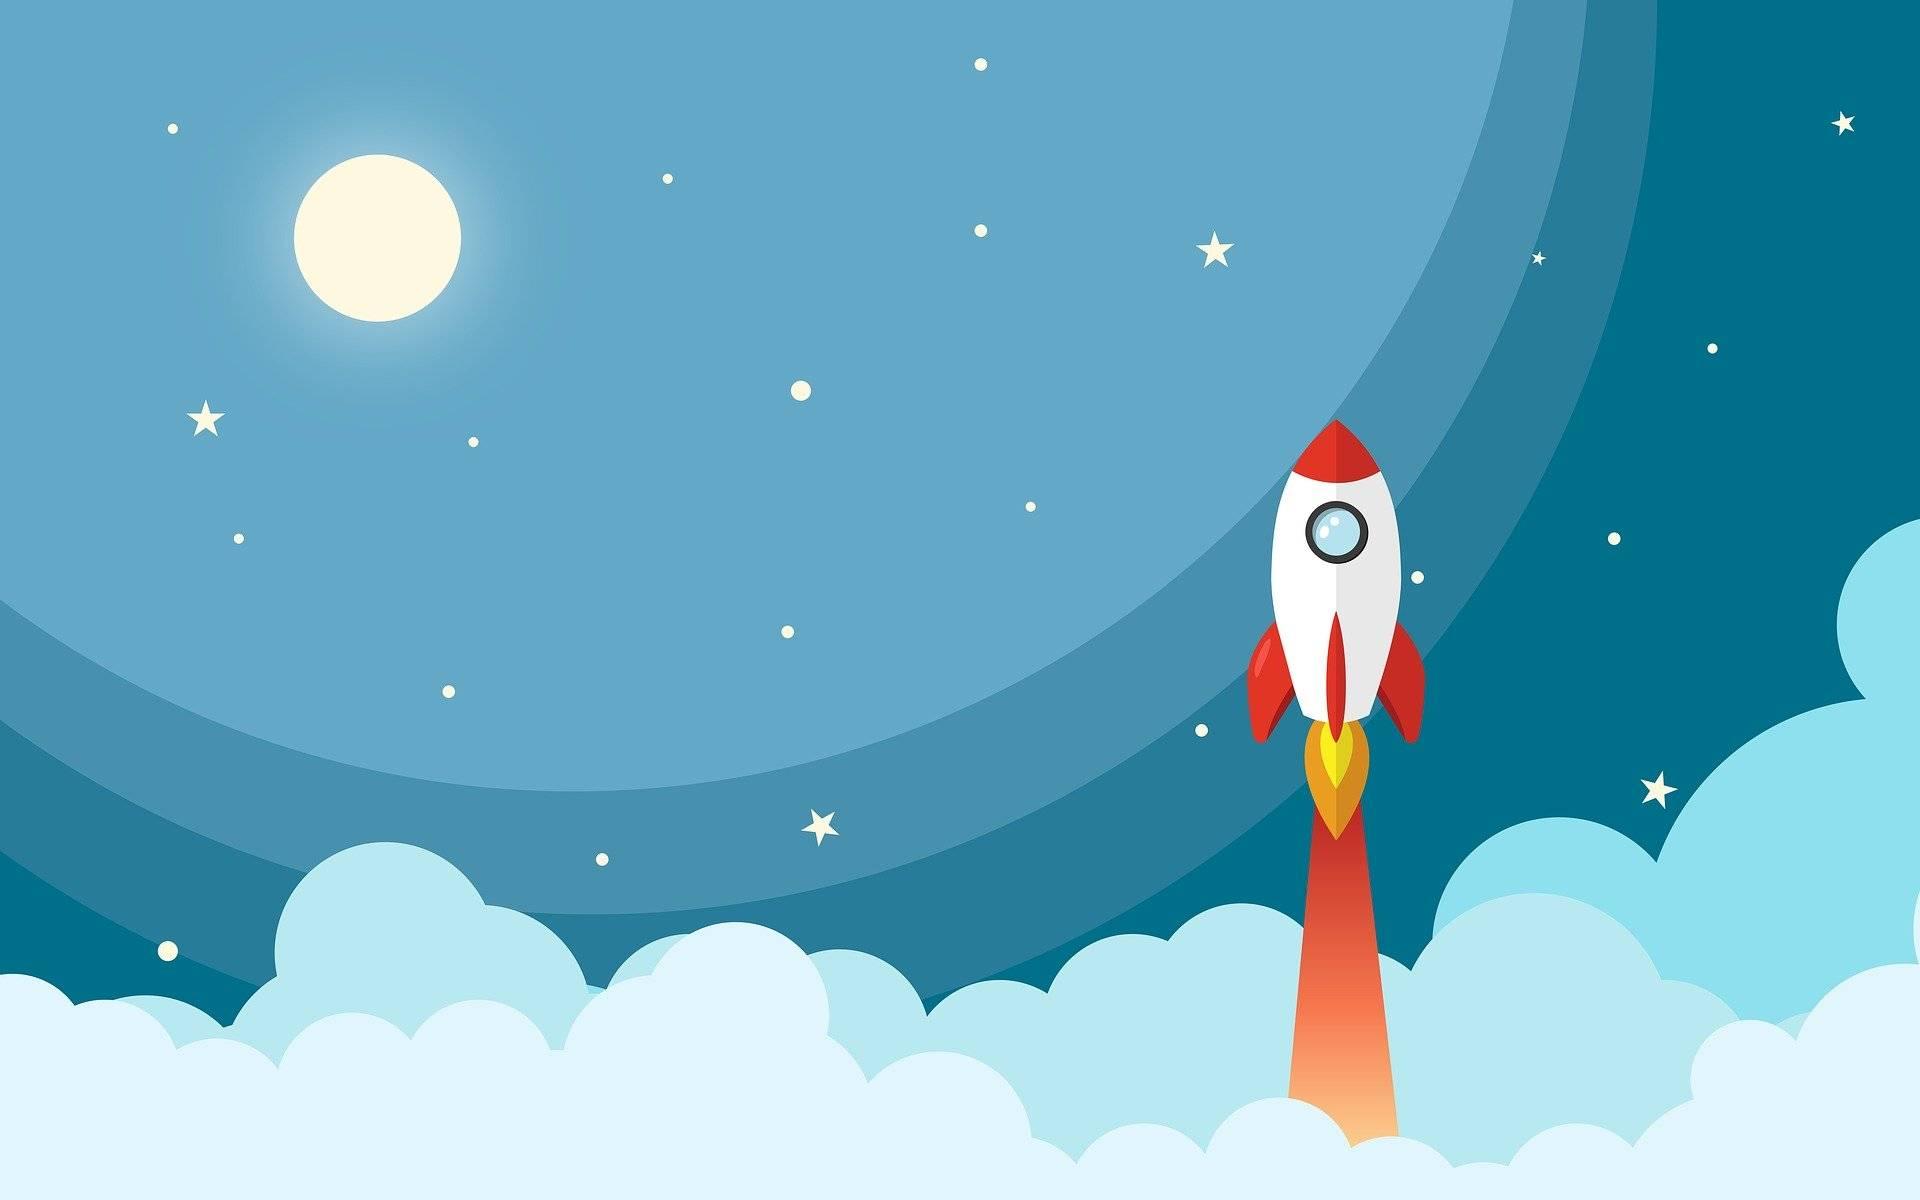 Bitcoin $BTC to the moon